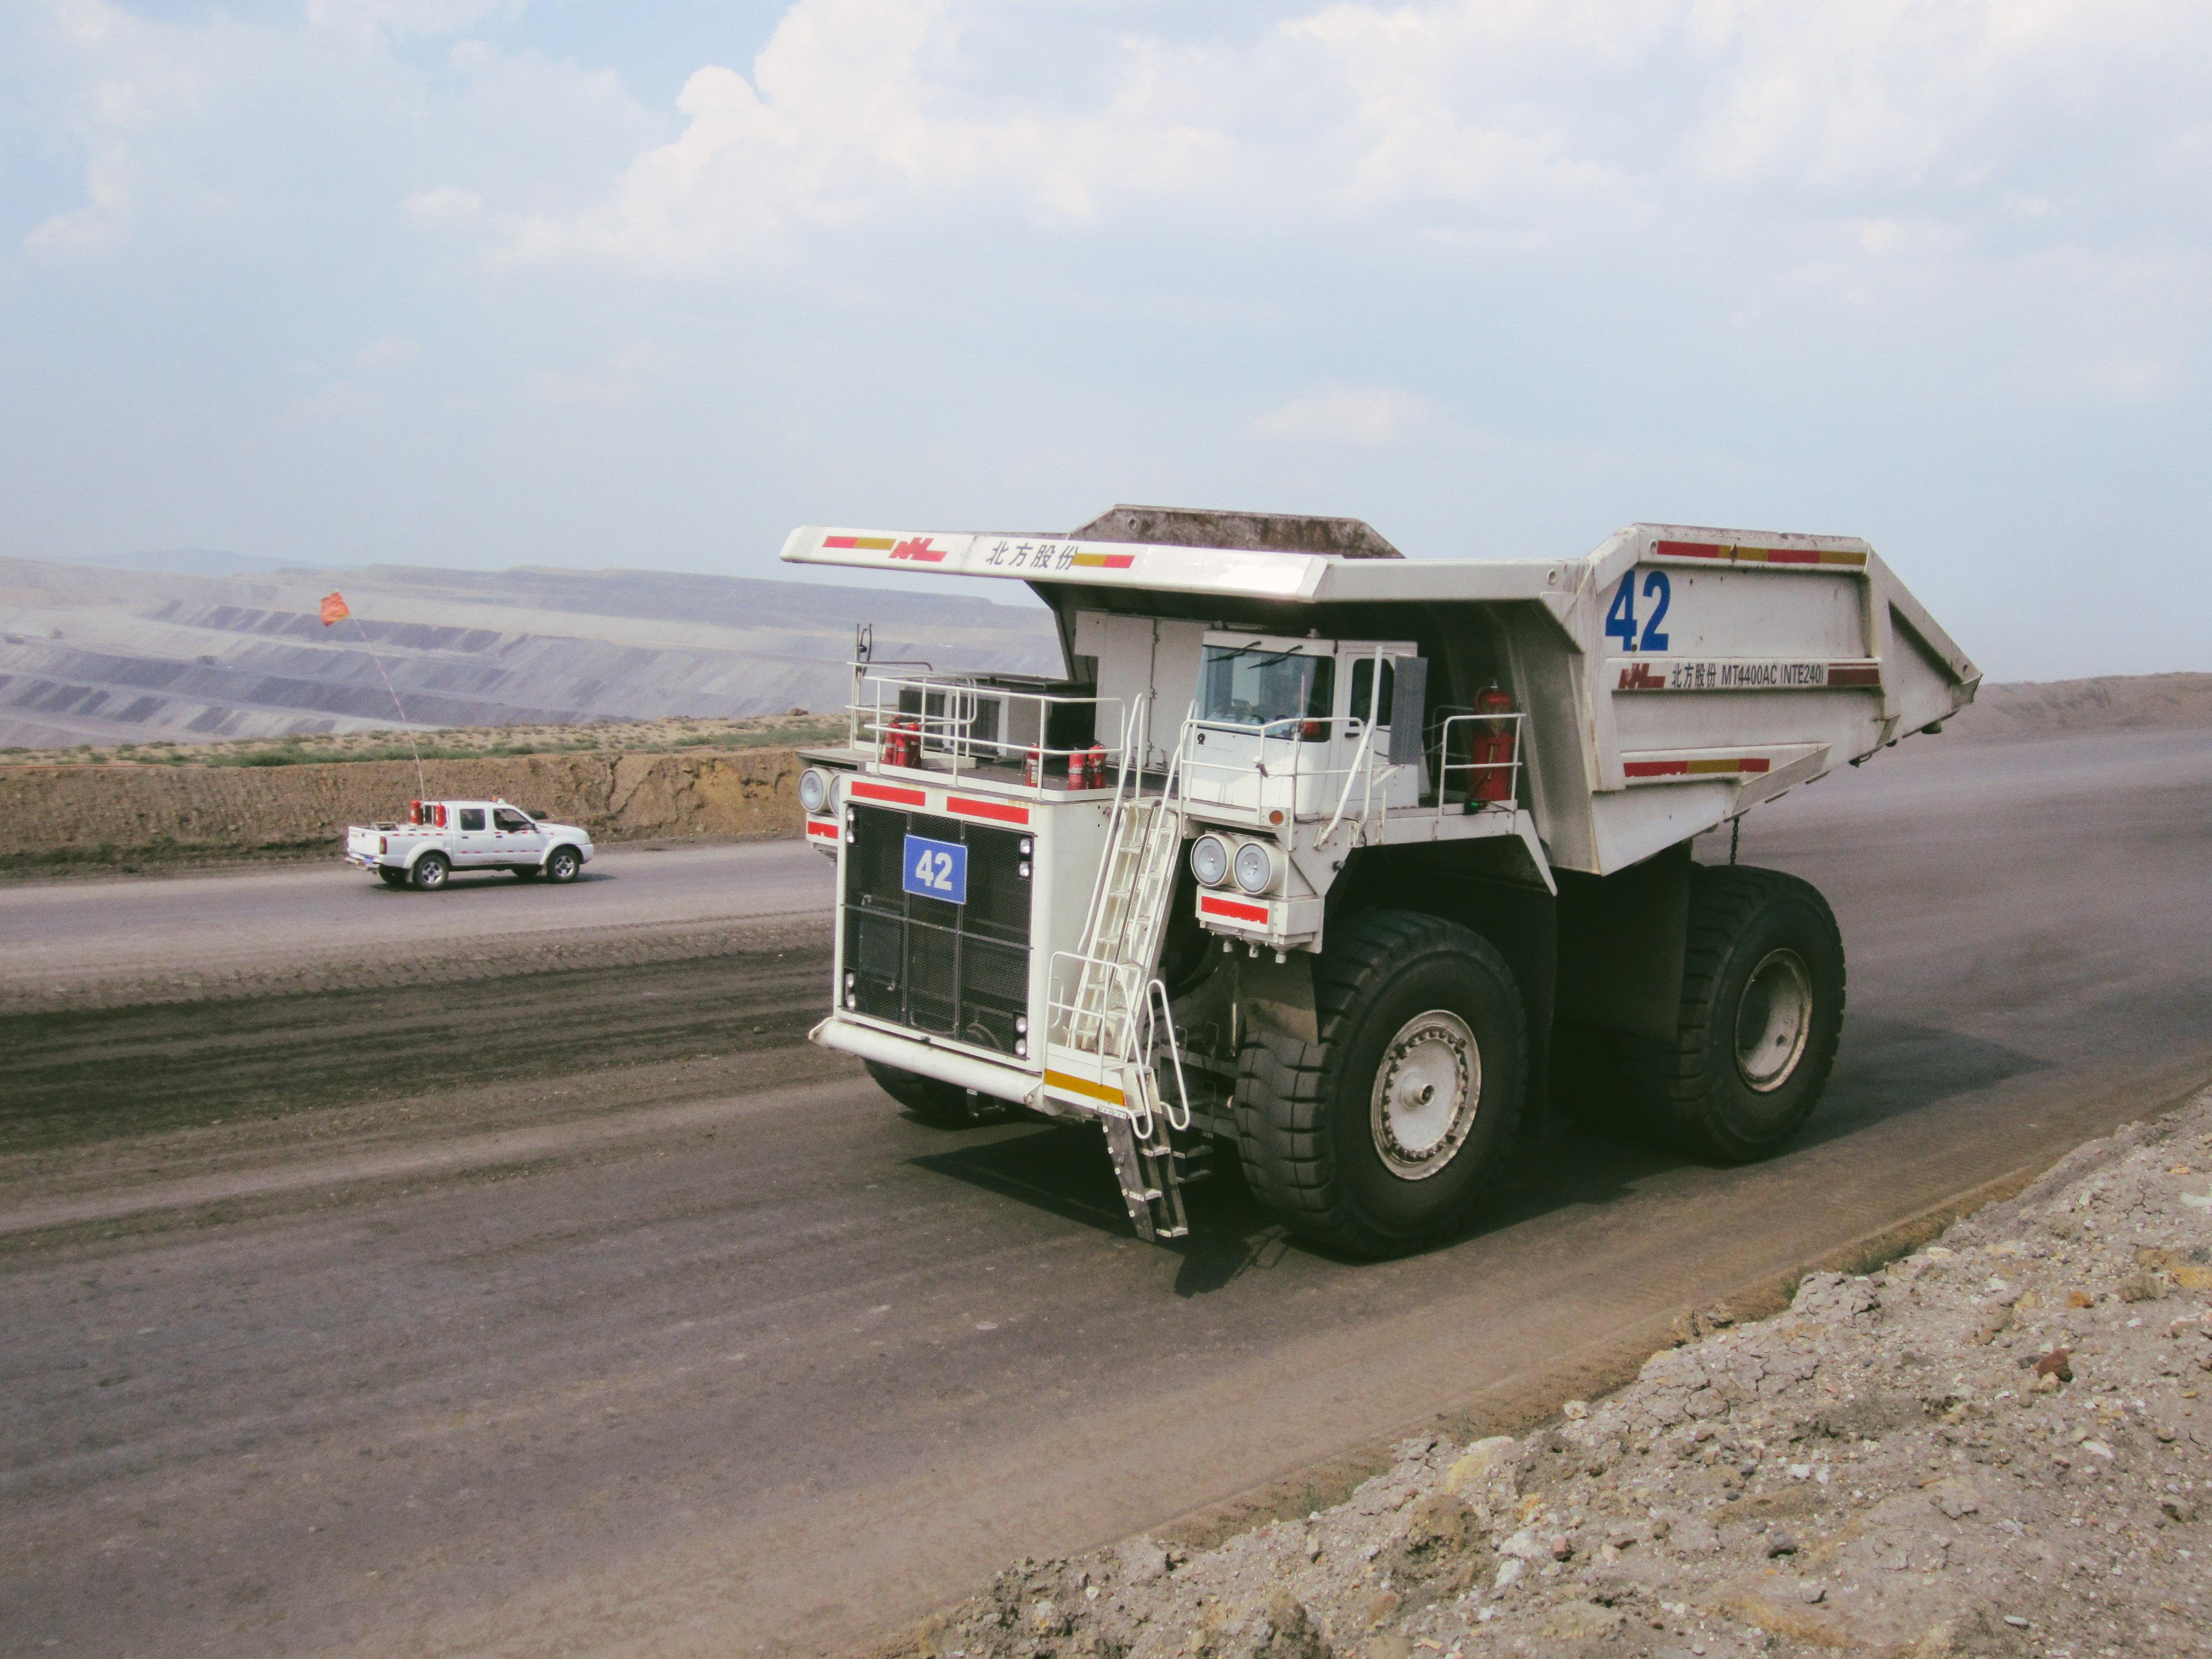 Shenhua Coal Mine - Xilinhot, China